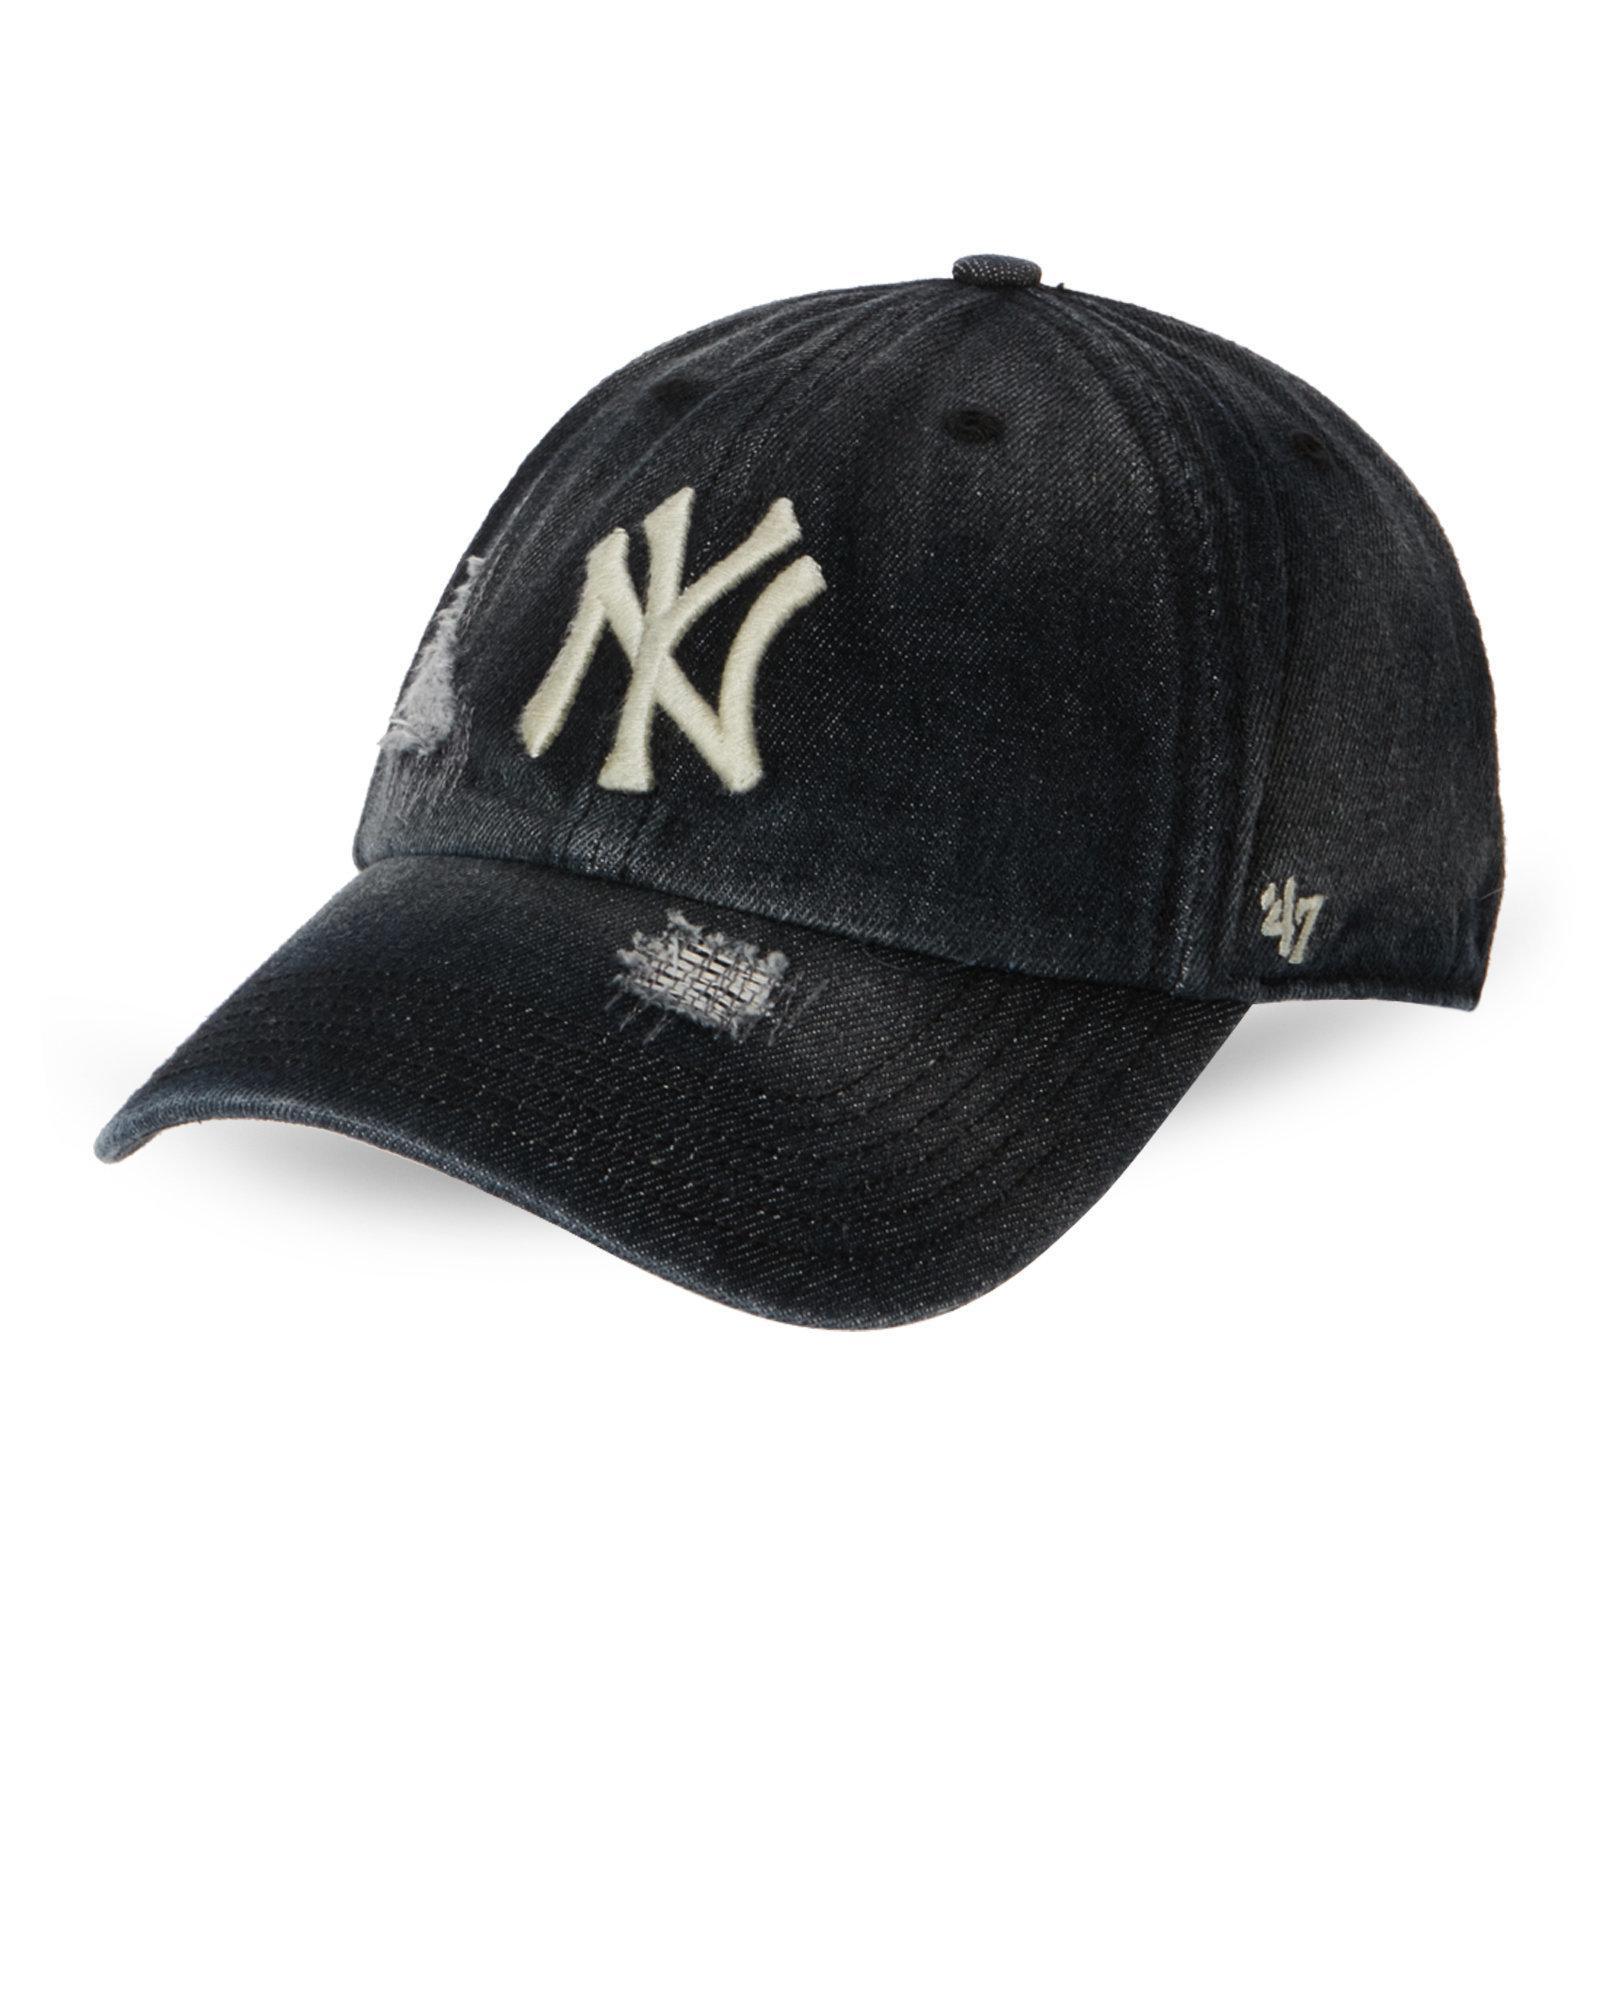 d9e2f1ecf authentic new york yankees distressed hat f6199 1fd6f